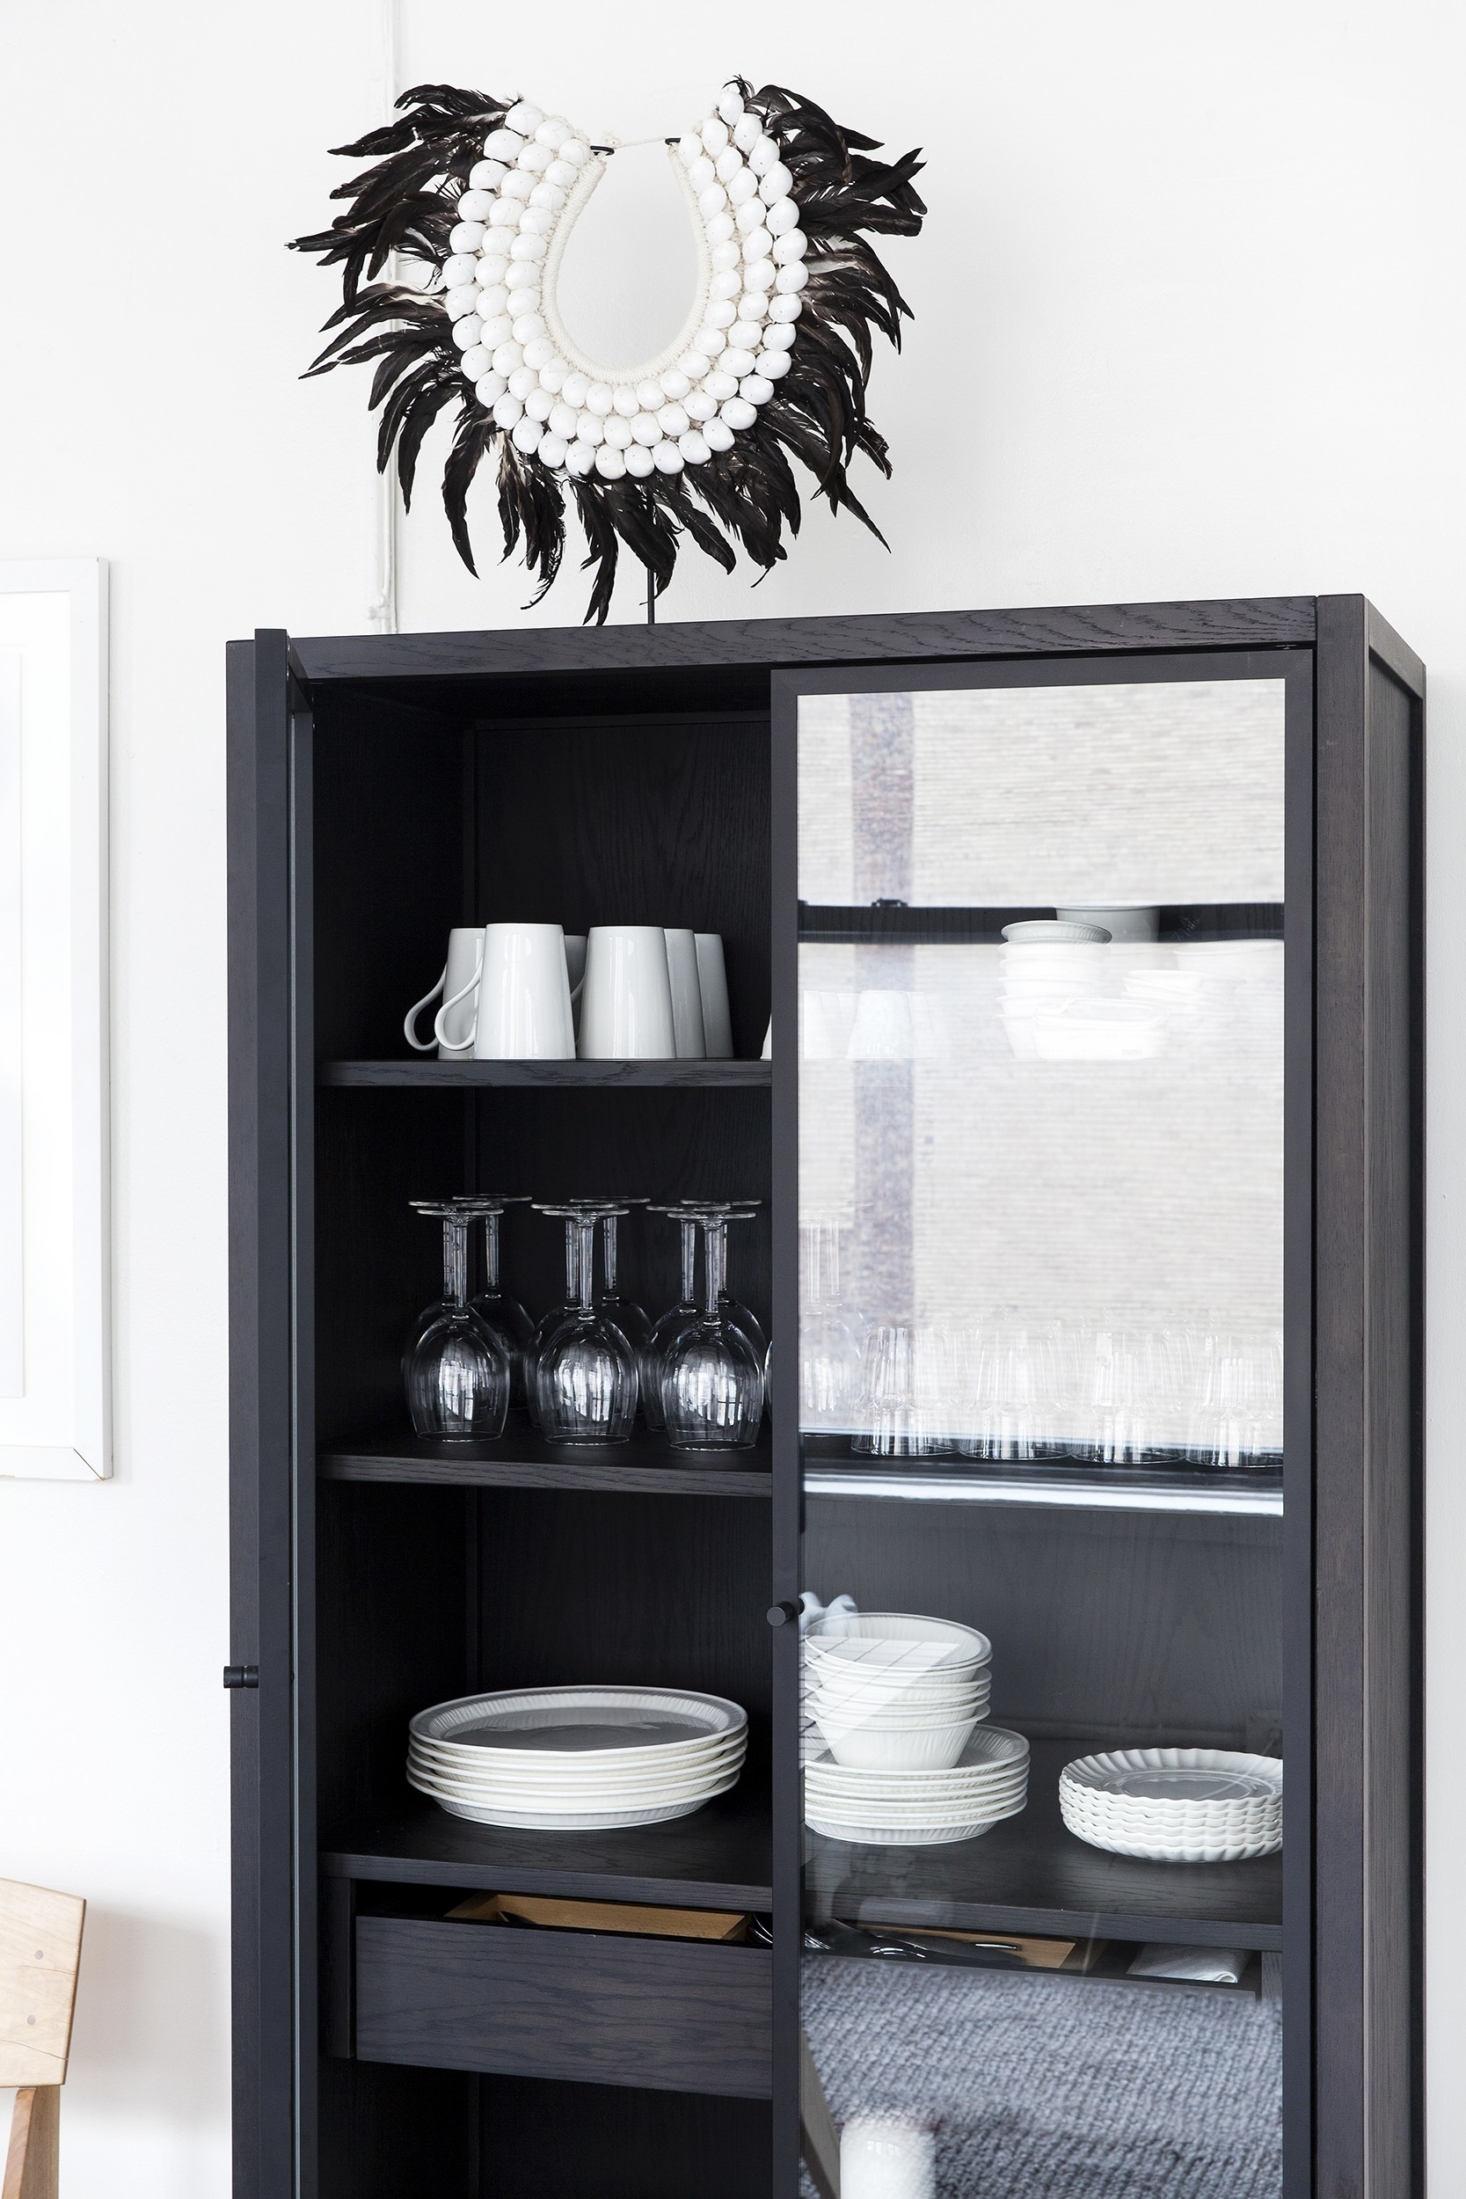 witness-apartment-coquo-kitchen-new-york-city-cabinet-1-1466x2199.jpg